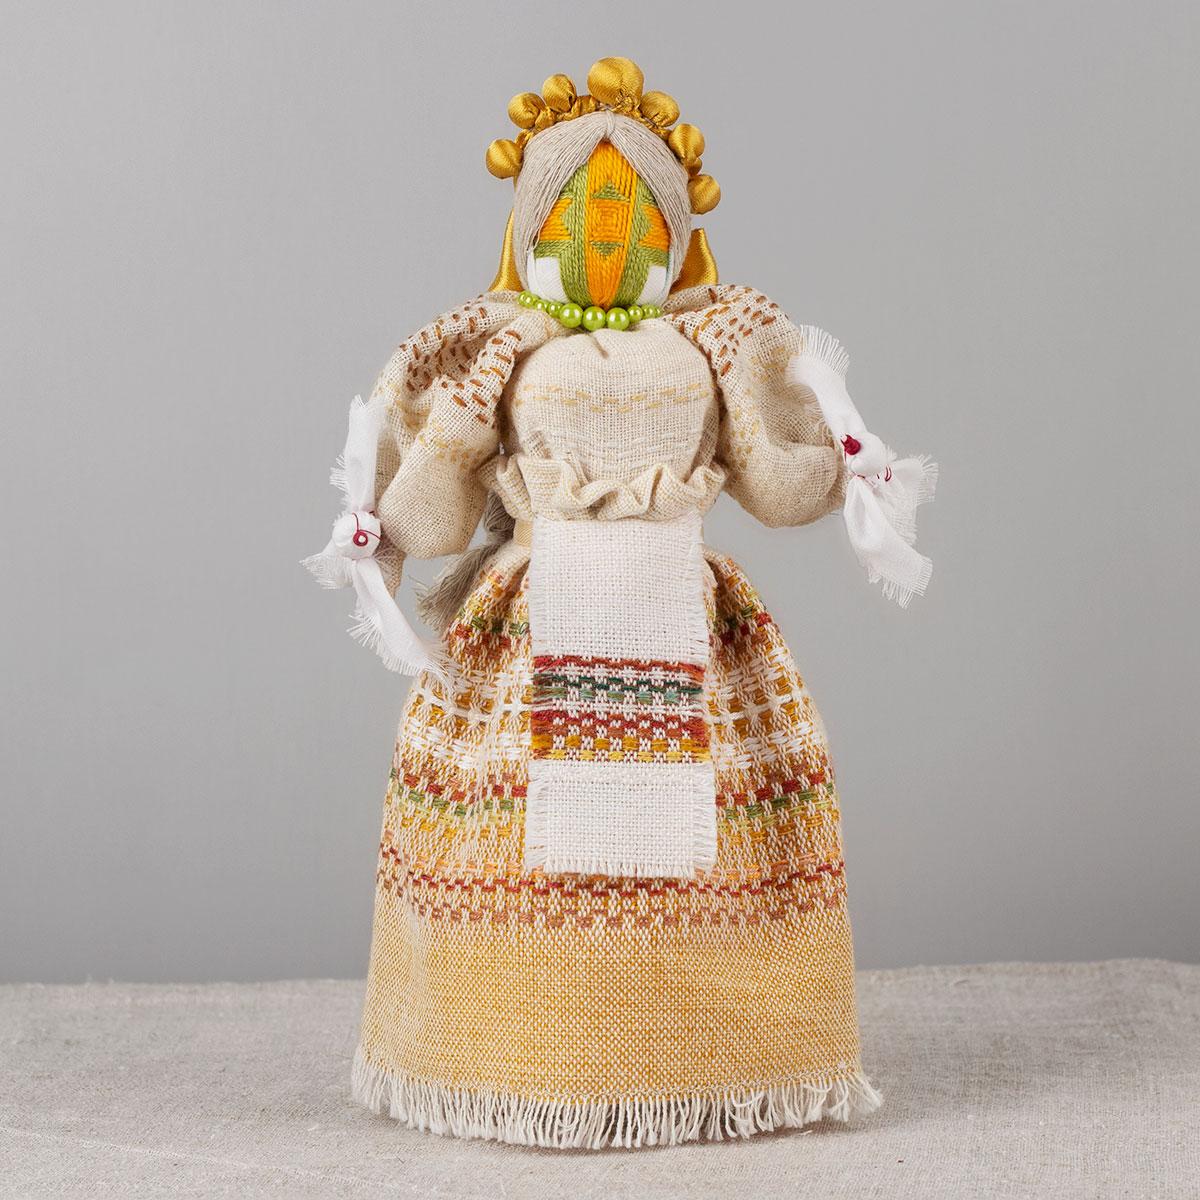 Motanka Doll for making a wish